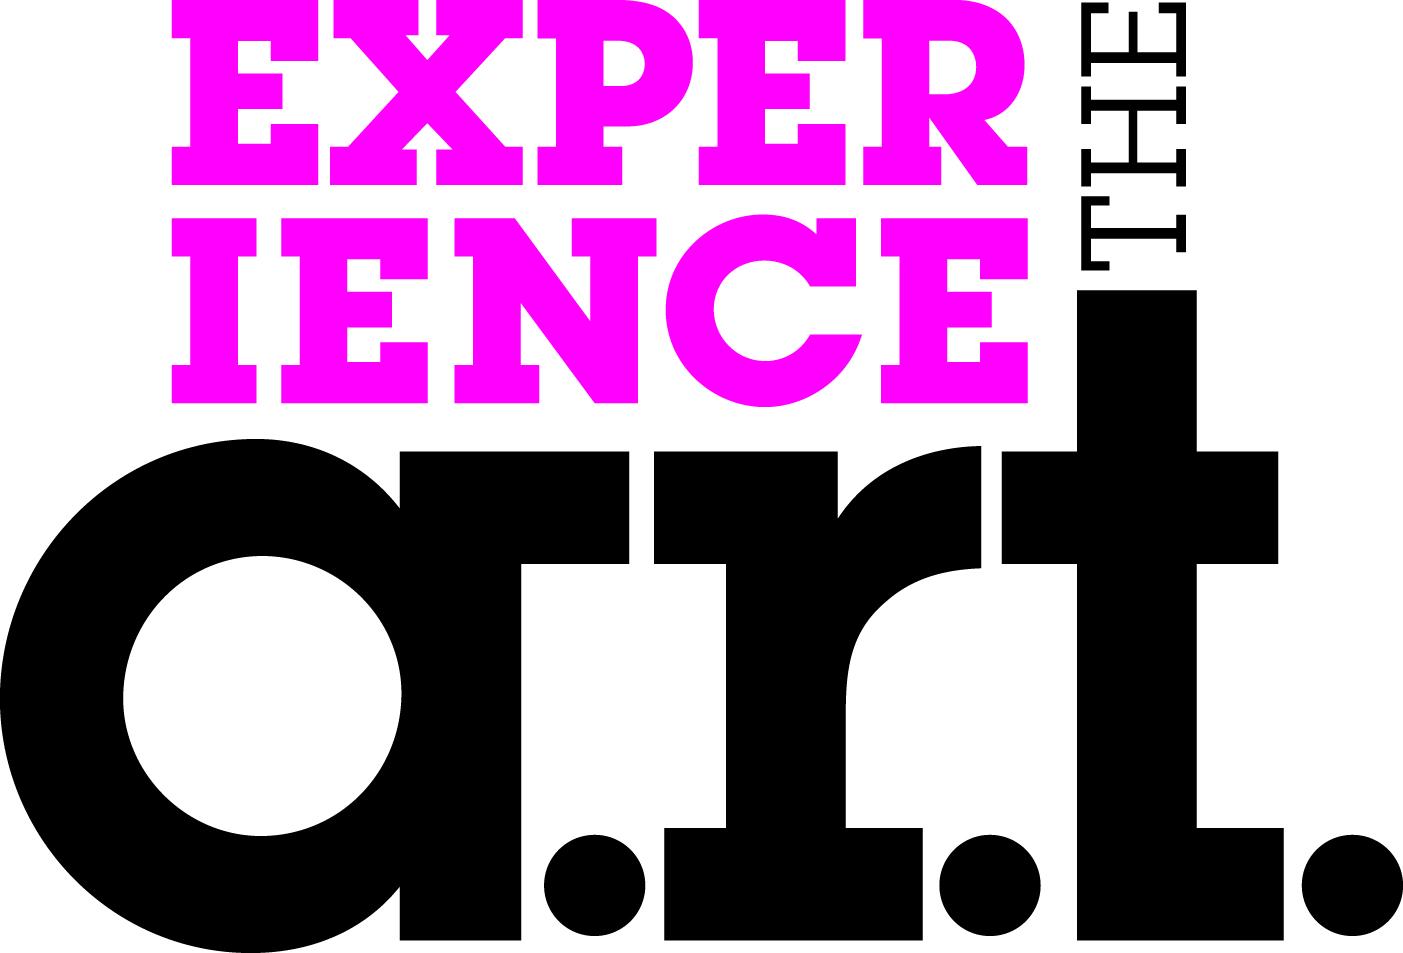 expART_logo_magblk.jpg